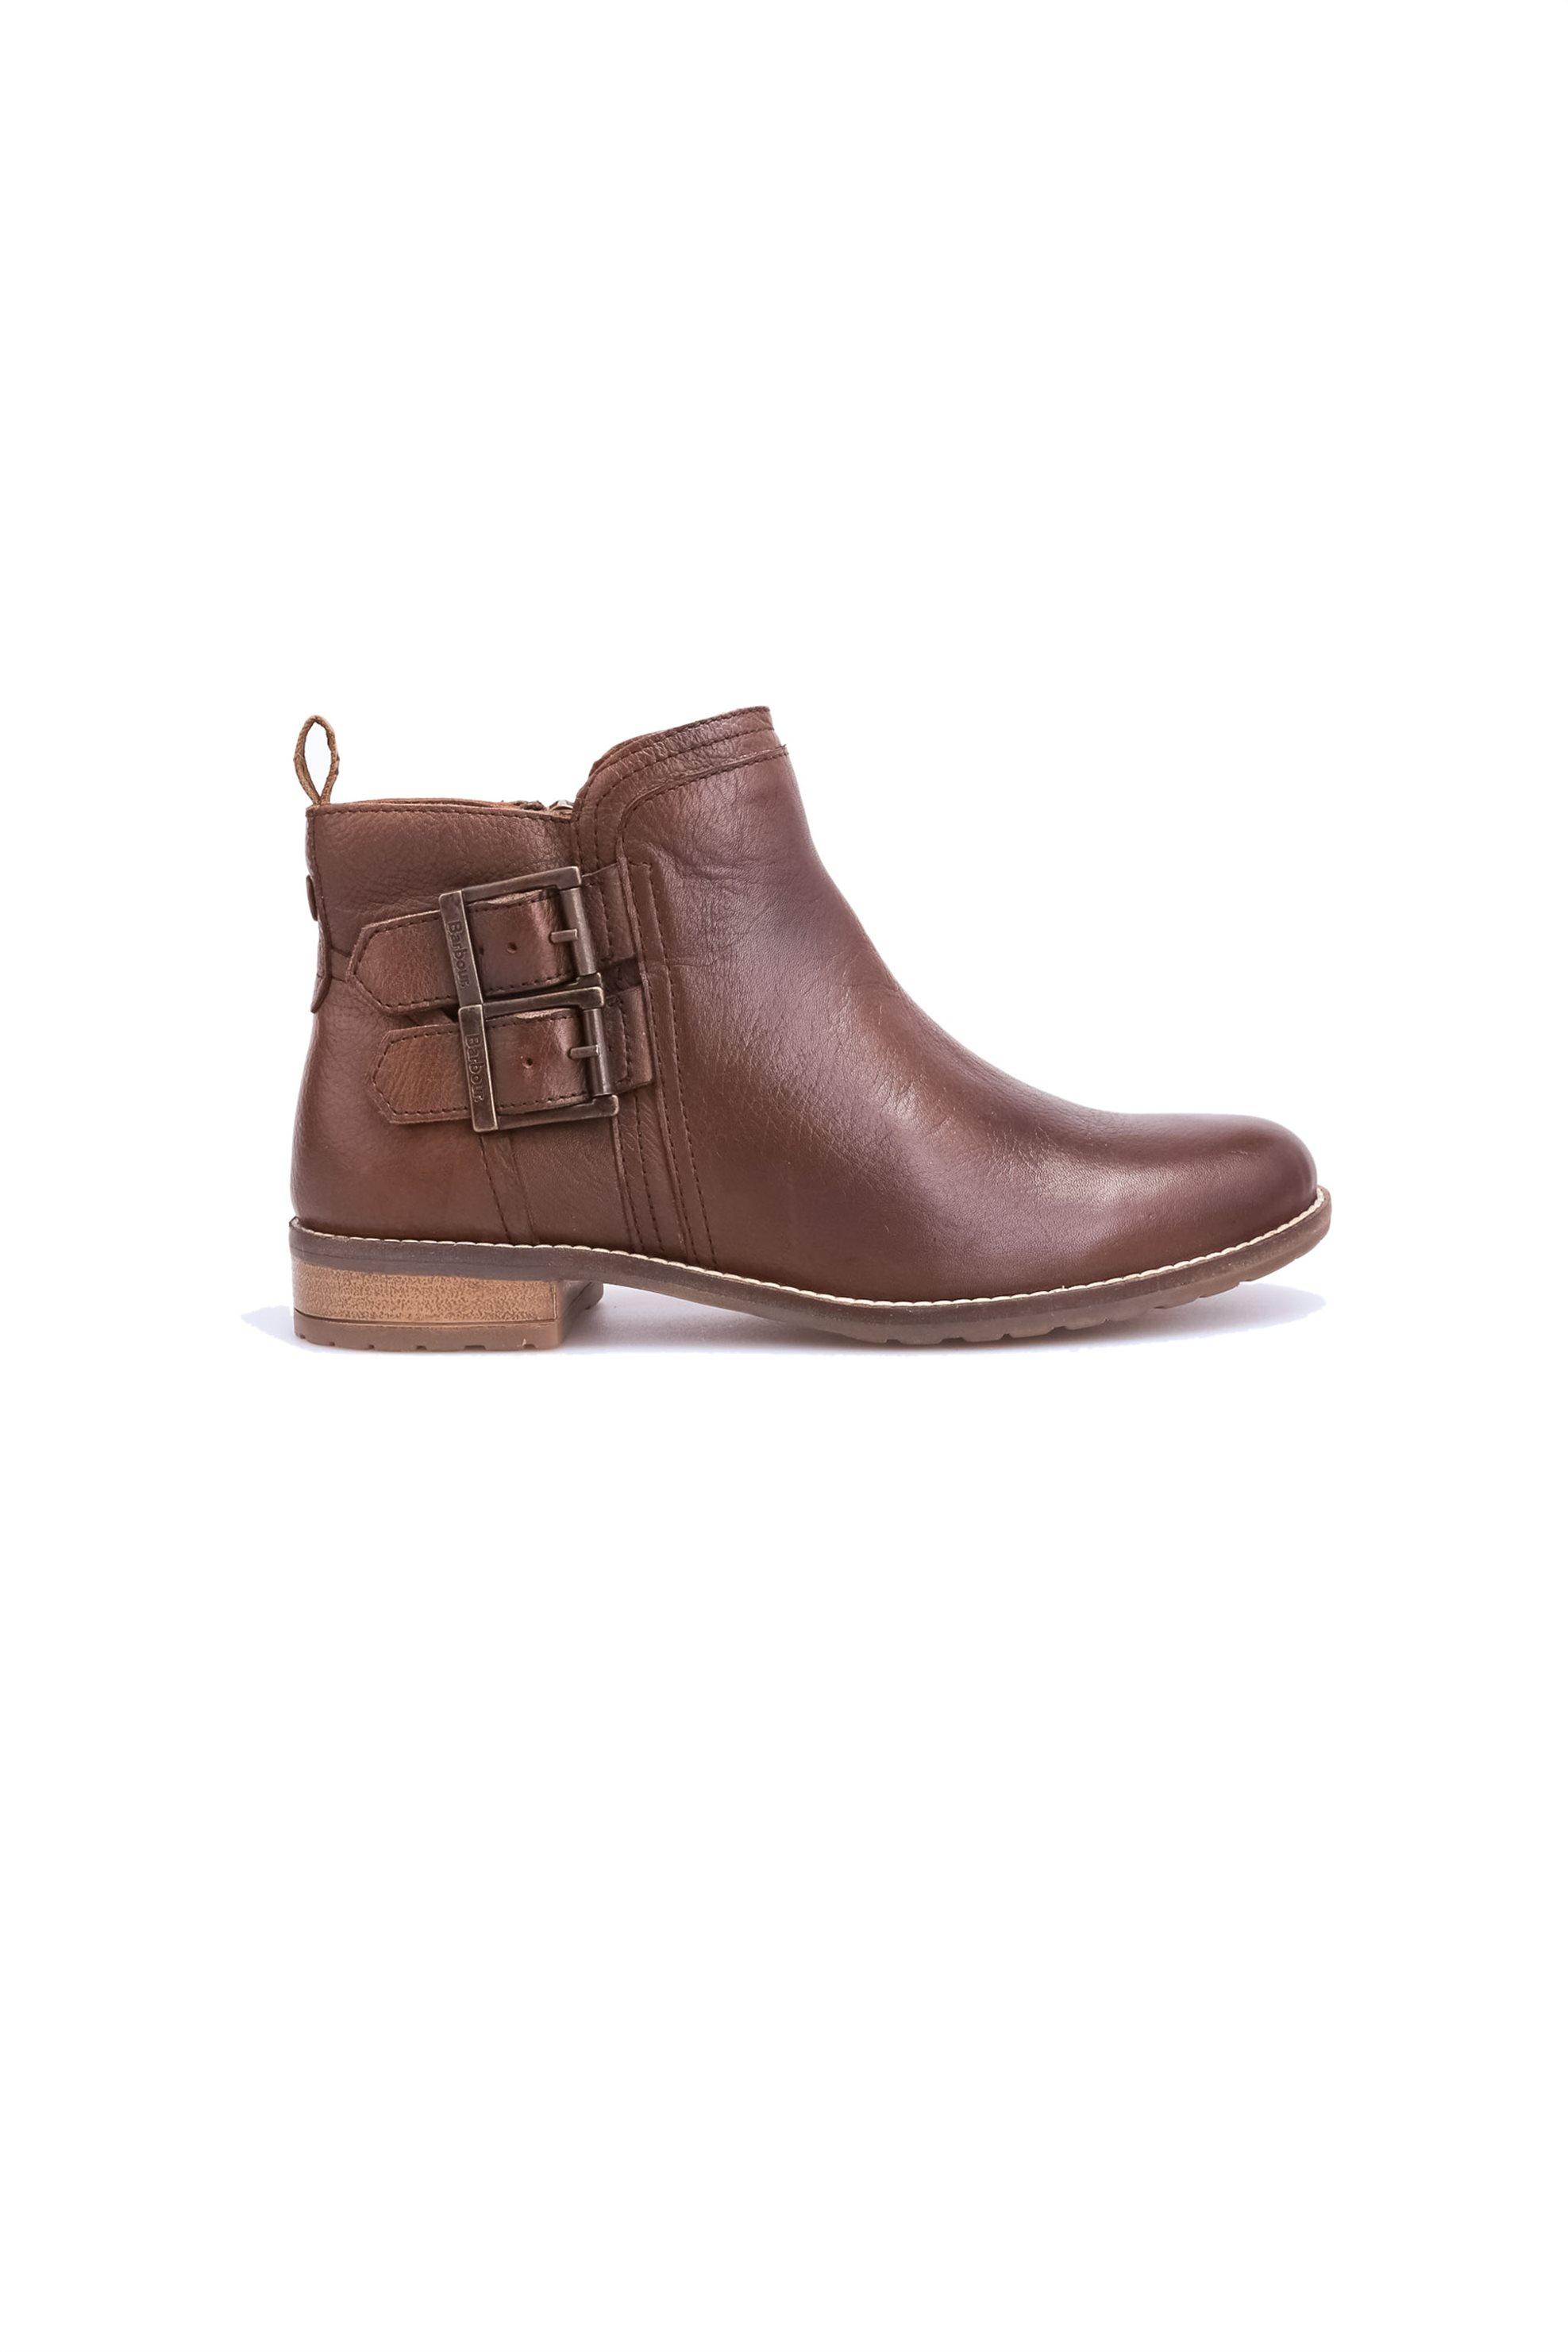 Barbour γυναικεία μποτάκια Sarah Low Buckle Boot – LFO0212 – Καφέ